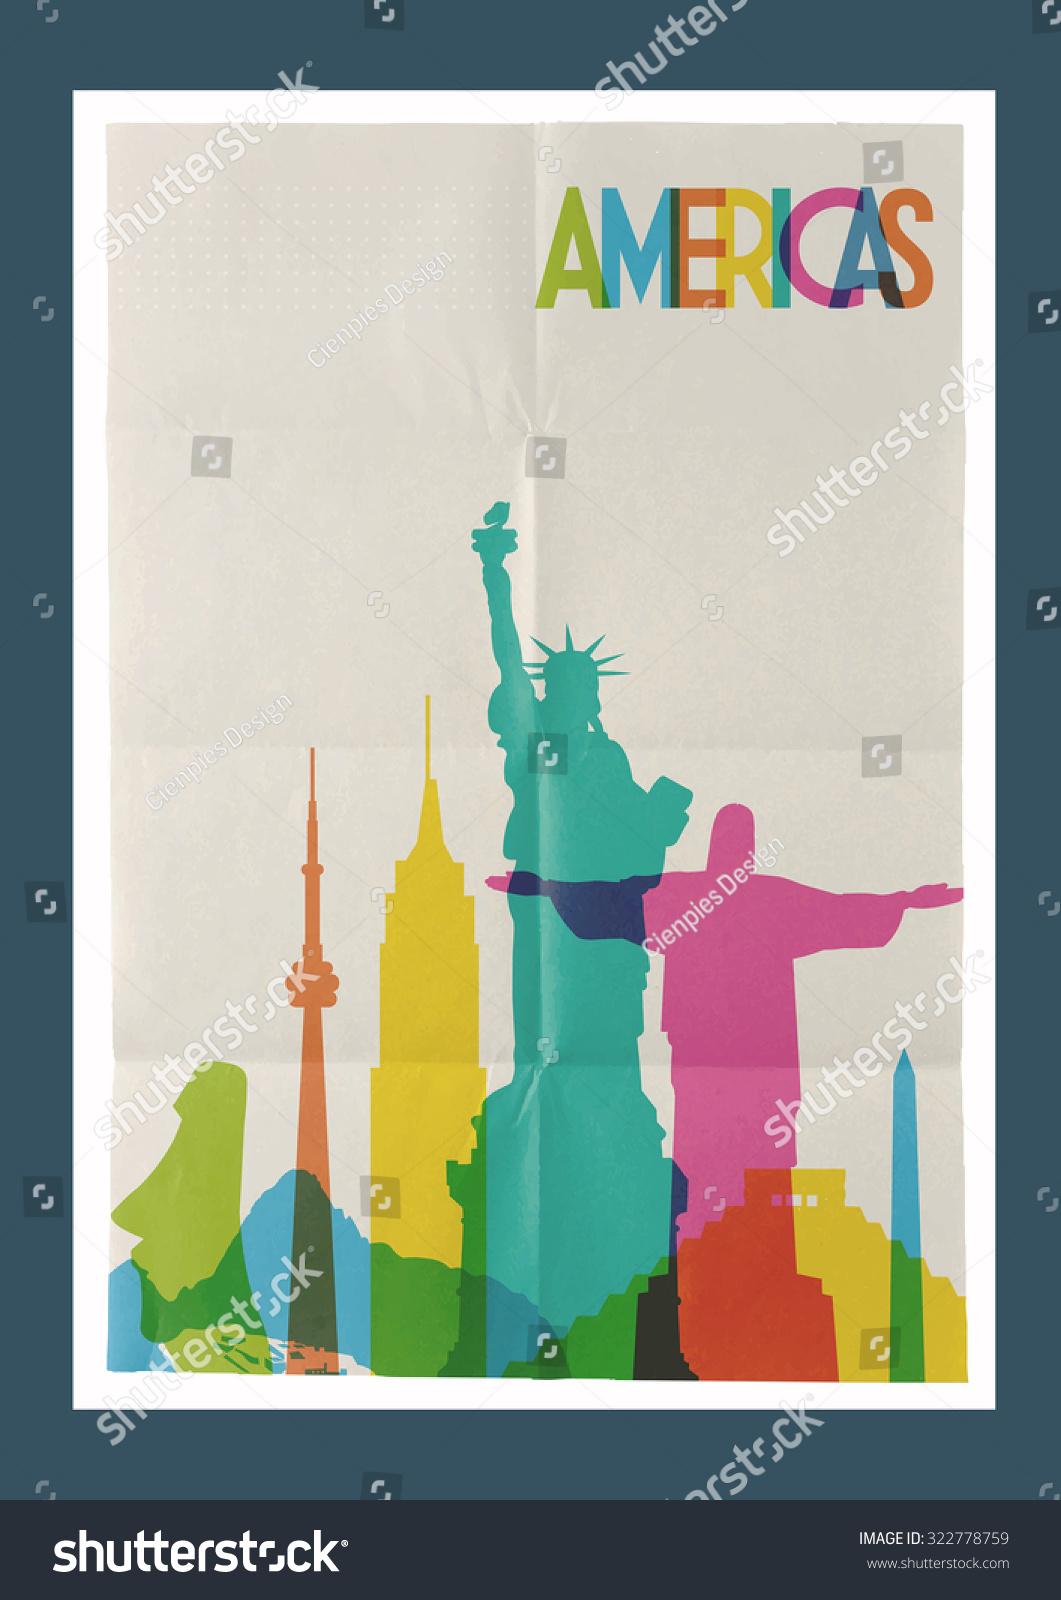 Poster design canva - Poster Design Your Own Travel The Americas Famous Landmarks Skyline On Vintage Paper Poster Sheet